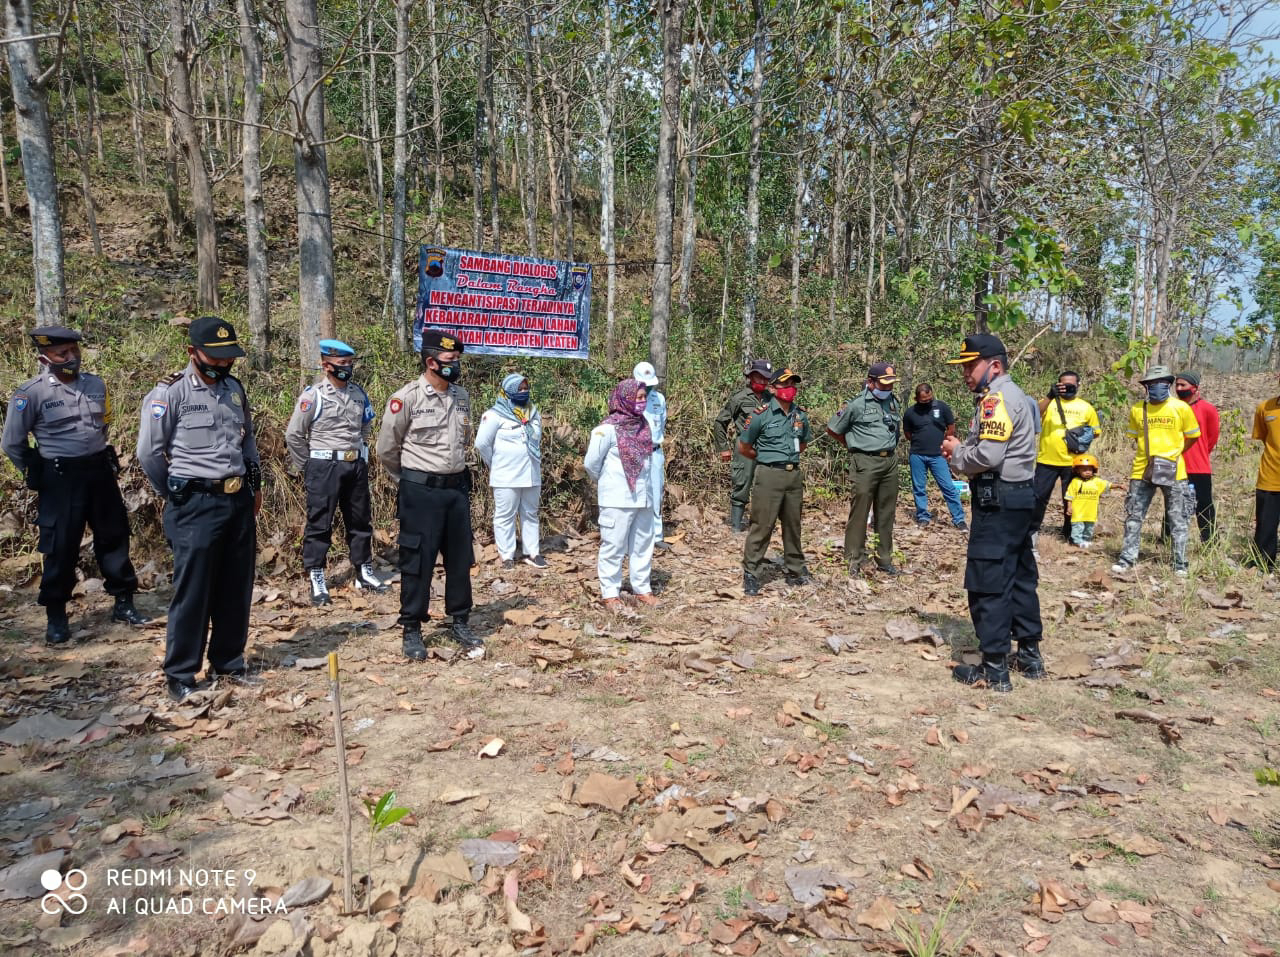 Sambang Dialogis Di Gunung Gajah, Poles Klaten Ajak Warga Jaga Hutan Dari Kebakaran